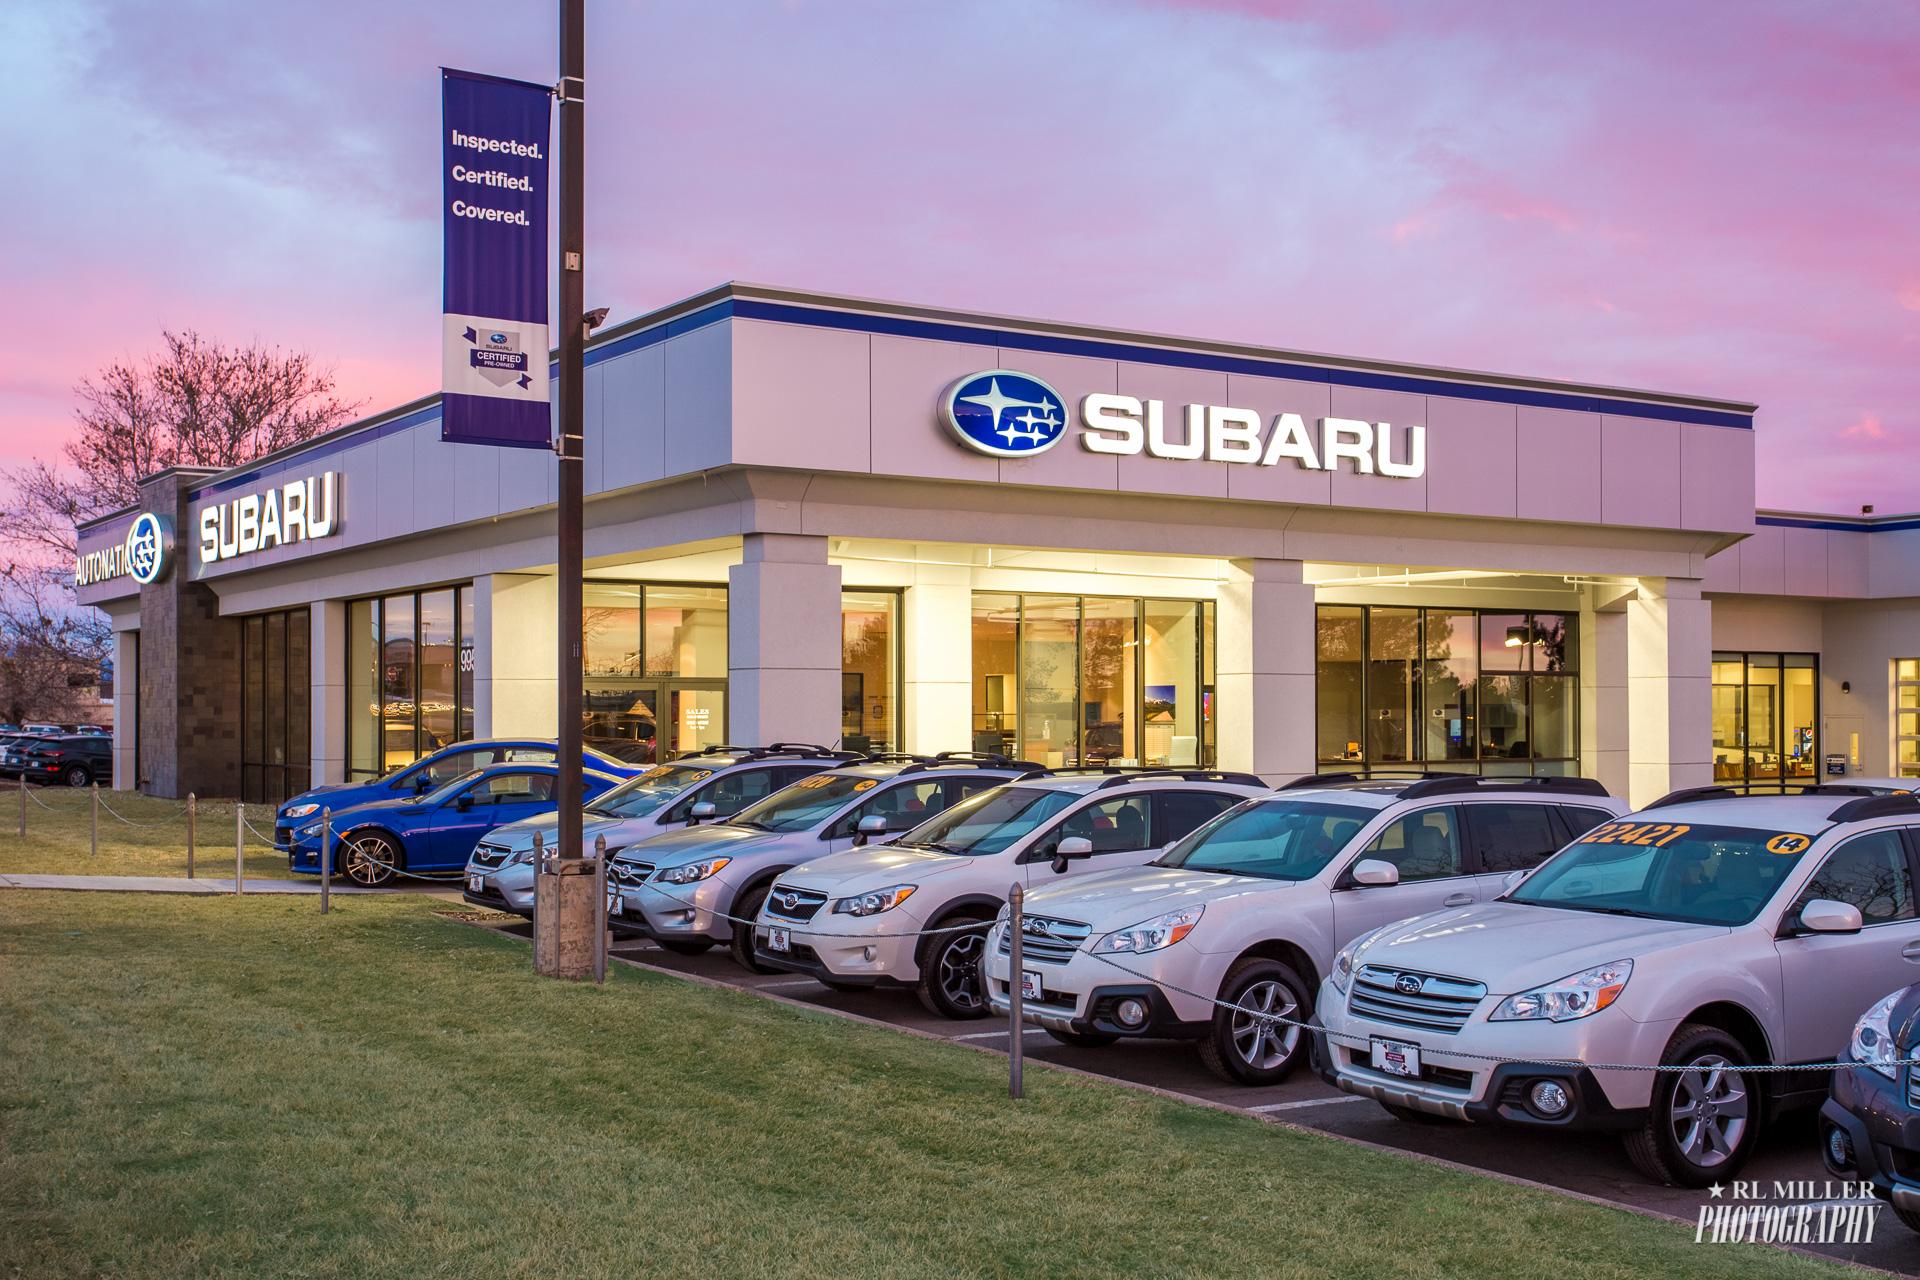 Subaru Arapahoe